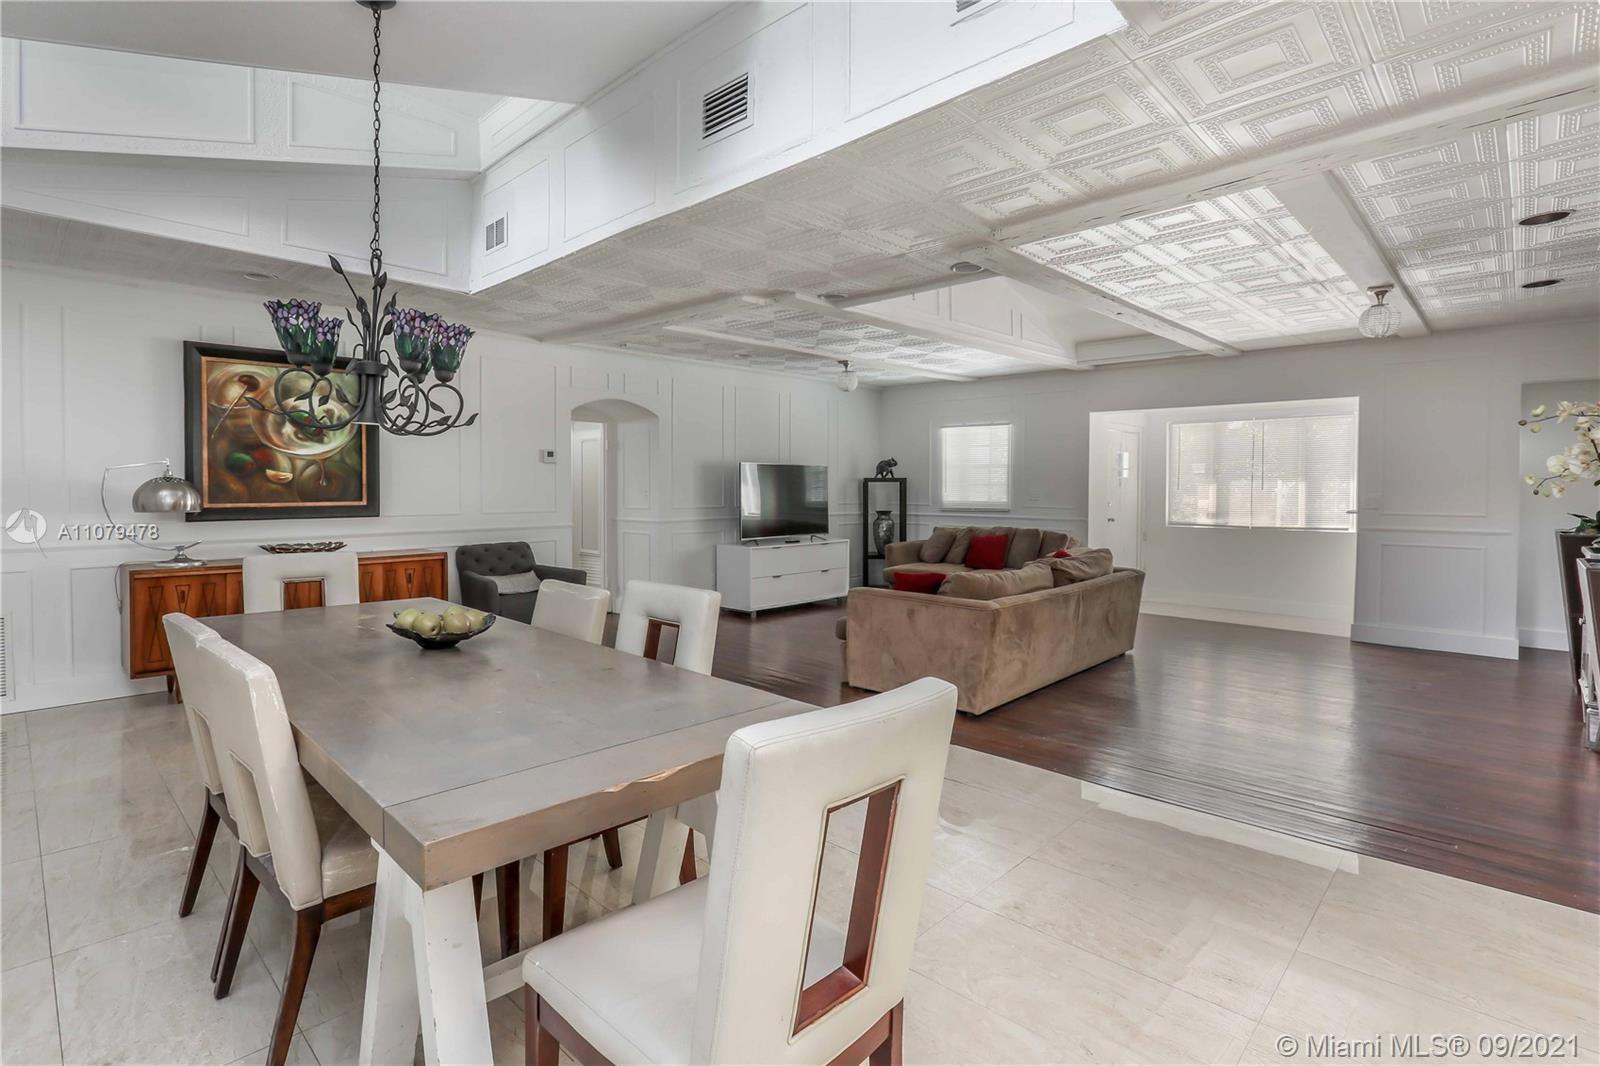 1505 Johnson St, Hollywood, FL 33020 - #: A11079478